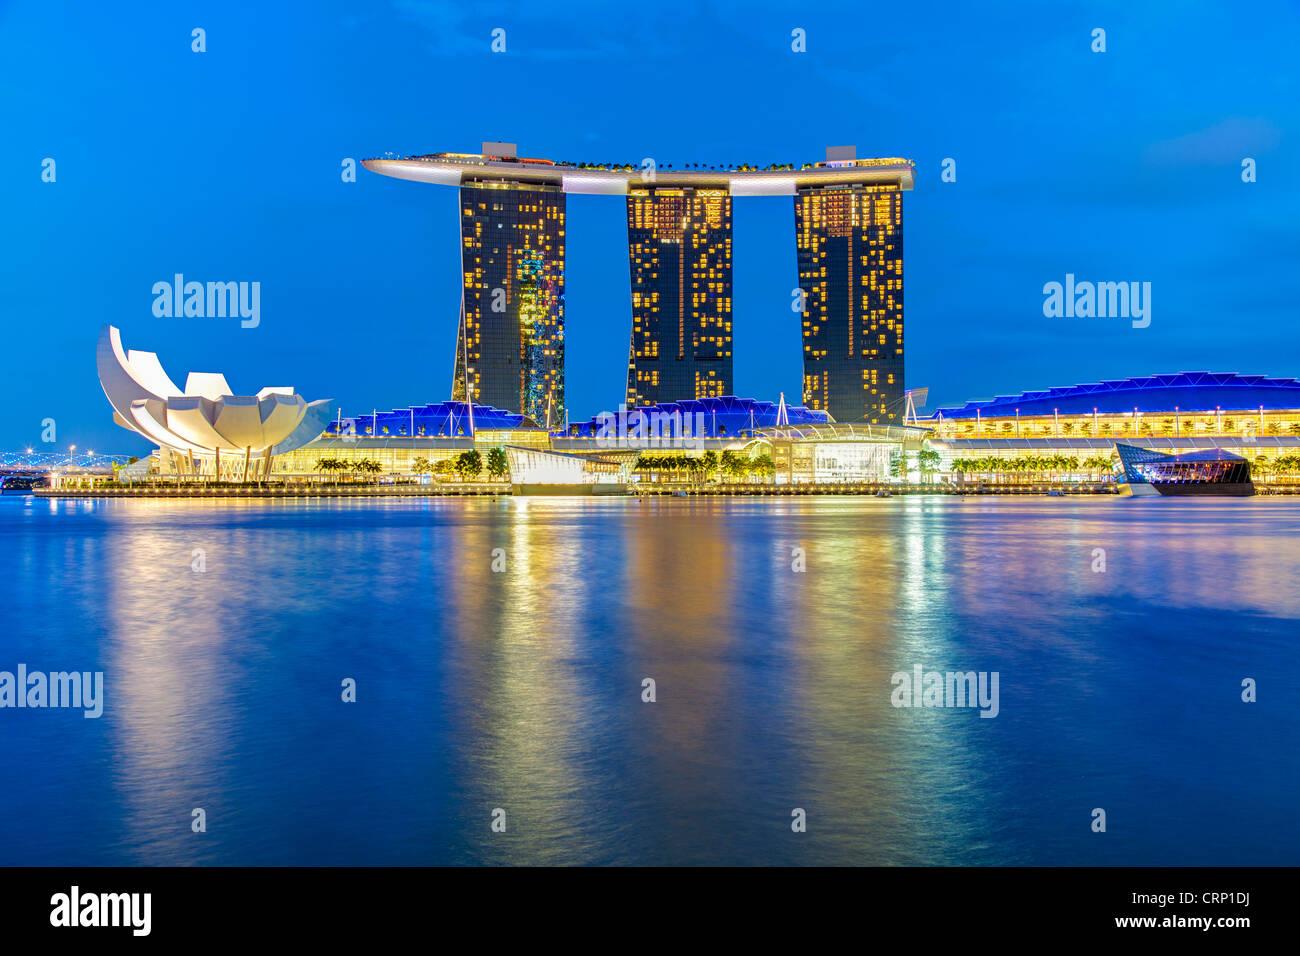 Marina Bay Sands, Marina Bay, Singapur, Sudeste de Asia Imagen De Stock